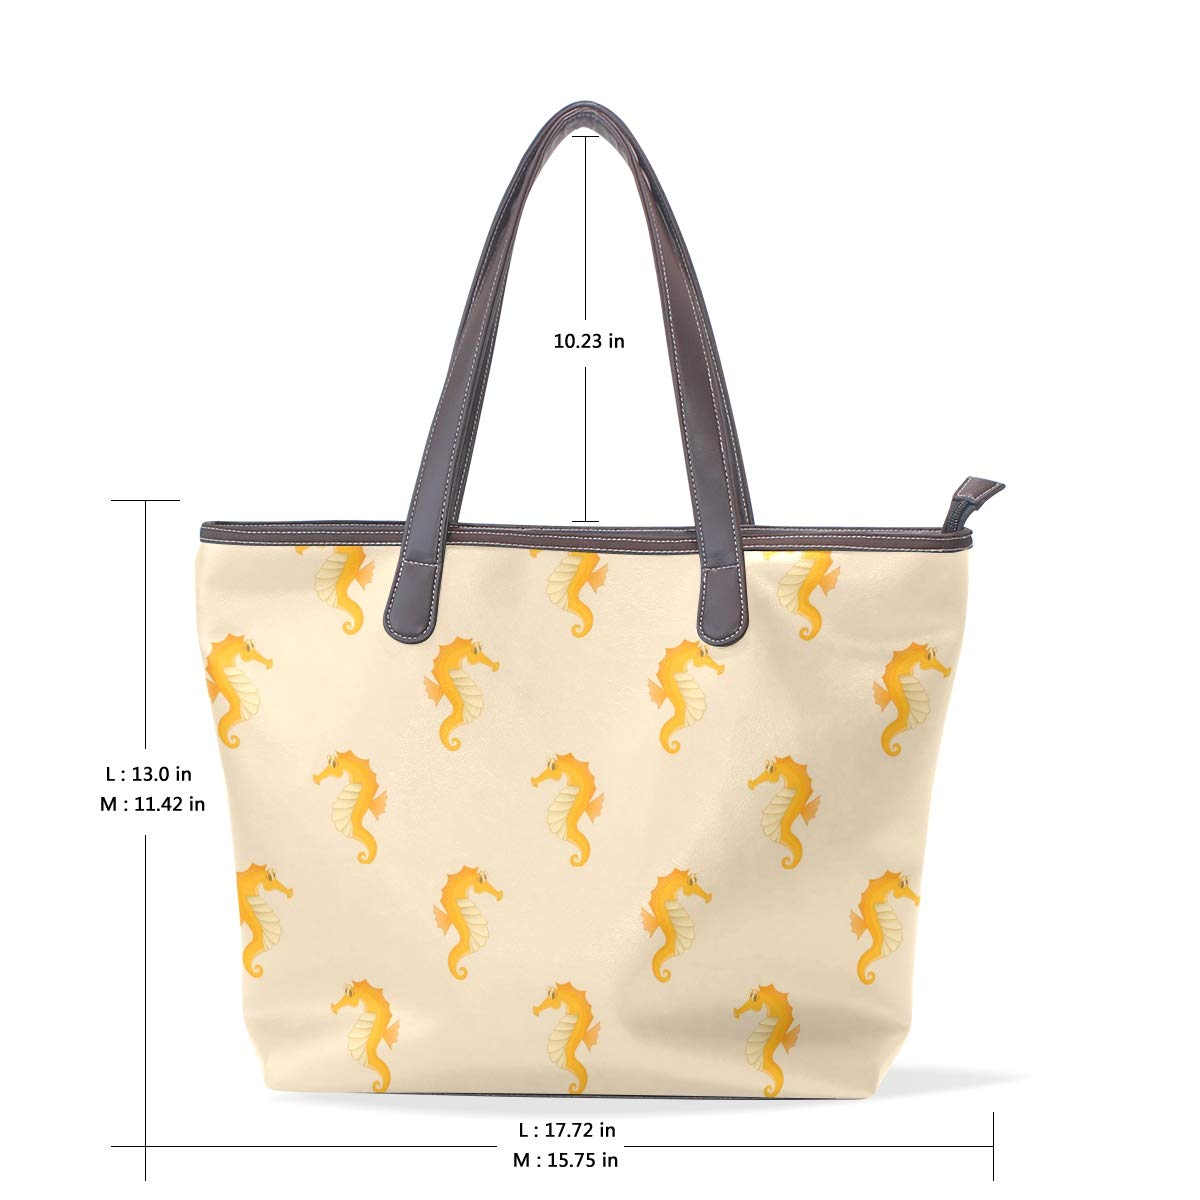 Golden Coast Sea Horse Womens Leather Handbag Shoulder Bag Satchel Handbags Leather Tote Purse Women Handle Handbags